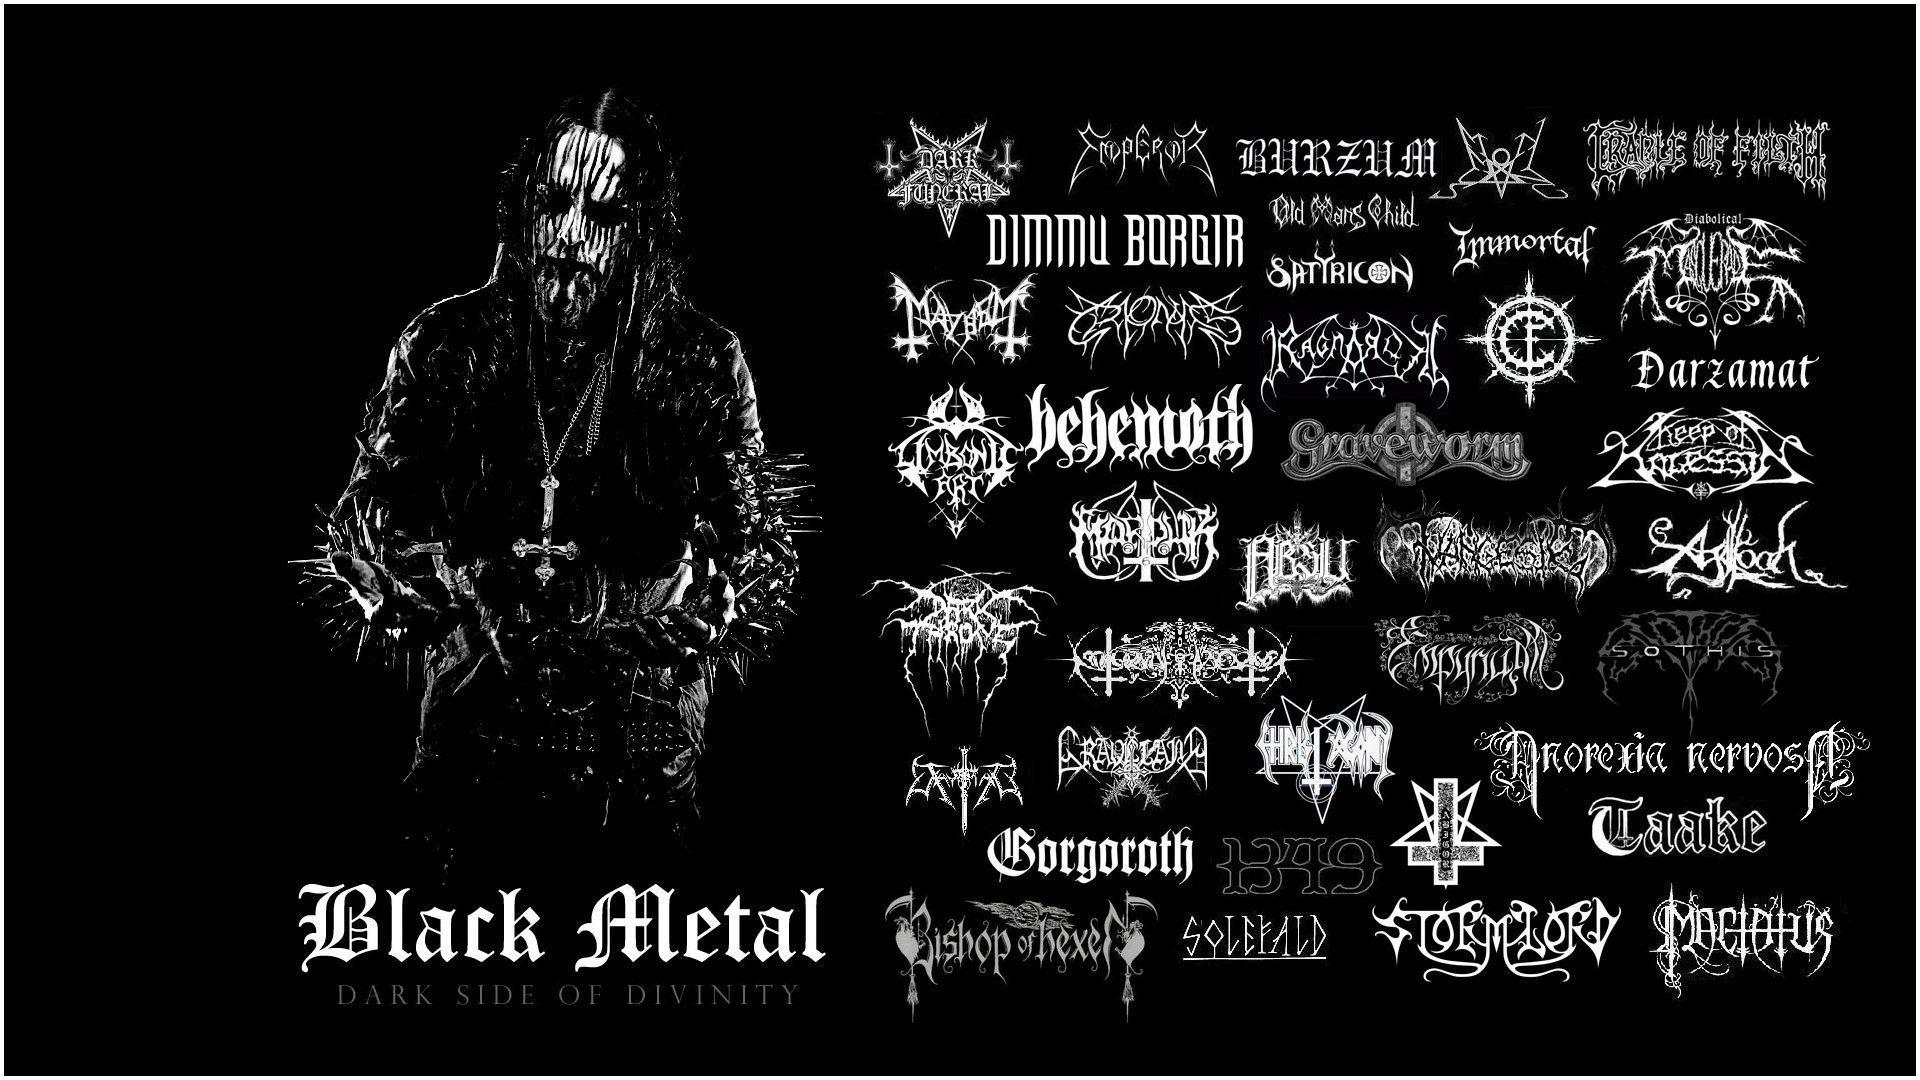 Free Gothic Doom symphonic black metal download Free Gothic